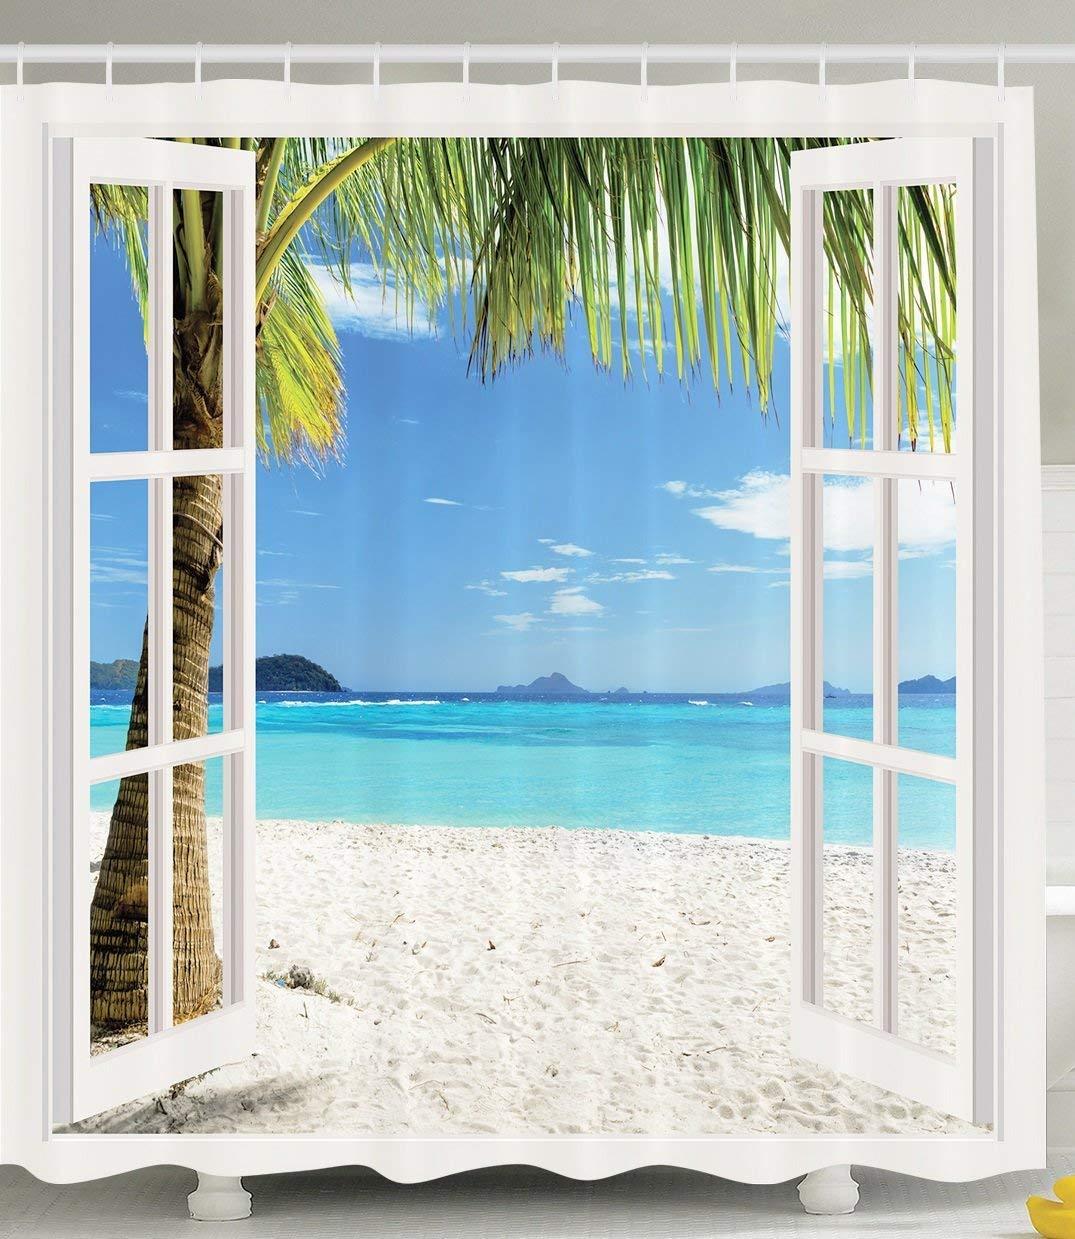 HUGS IDEA Ocean Sea Shower Curtain Bathroom Decor, Tropical Palm Trees on an Island Beach Through White Wooden Windows, Polyester Waterproof Fabric with Hooks, Blue Green White